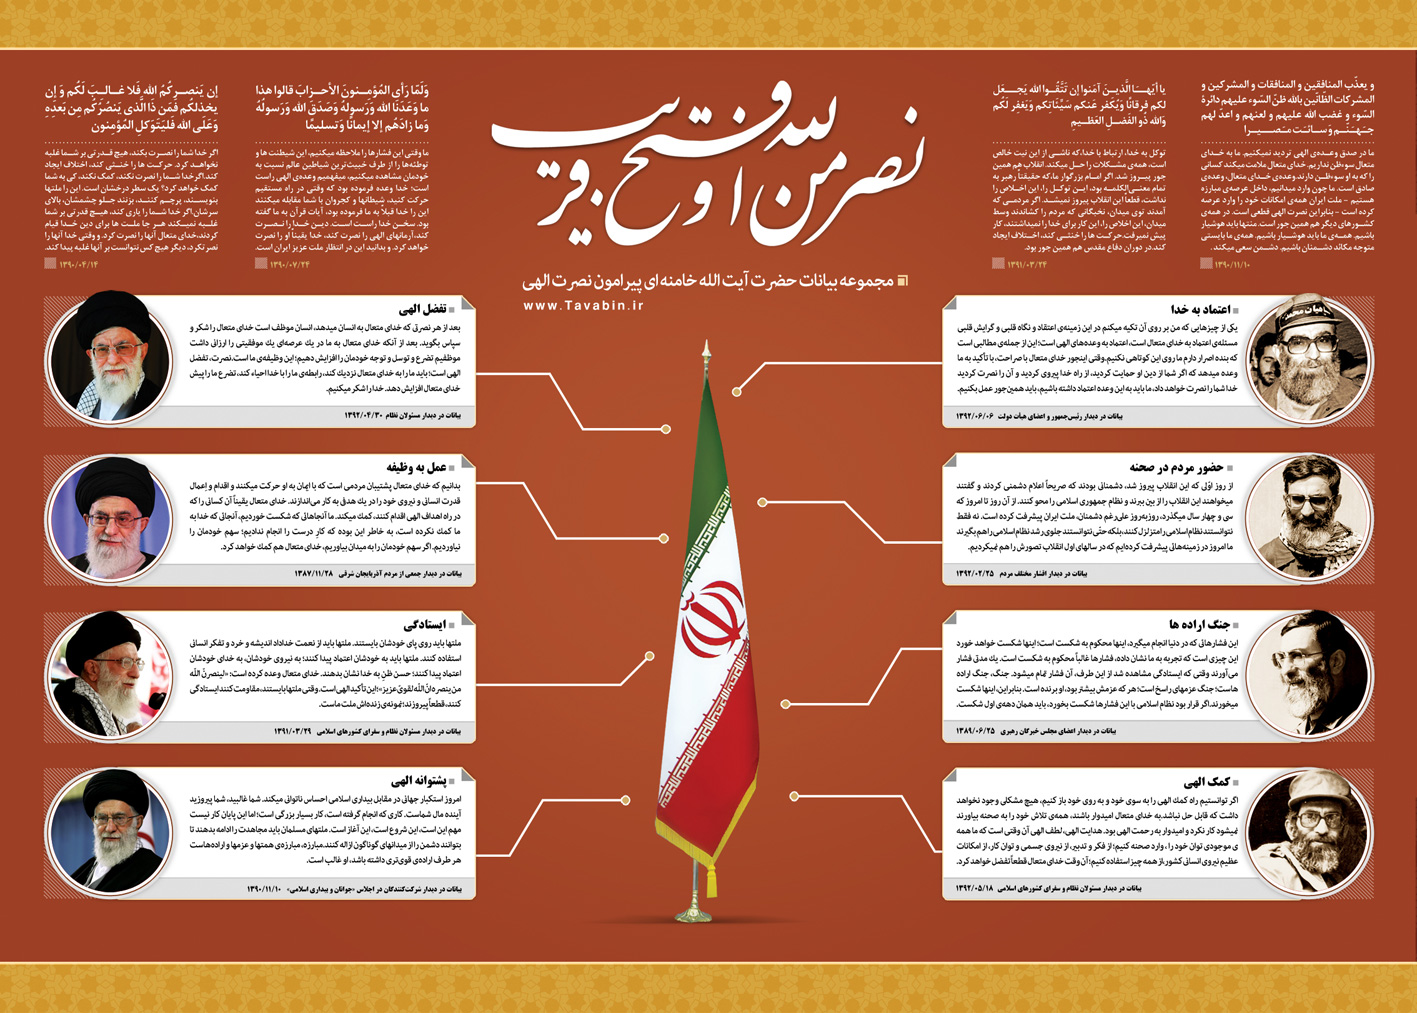 http://tavabin.ir/wp-content/uploads/2013/12/info-nosratelahi1.jpg